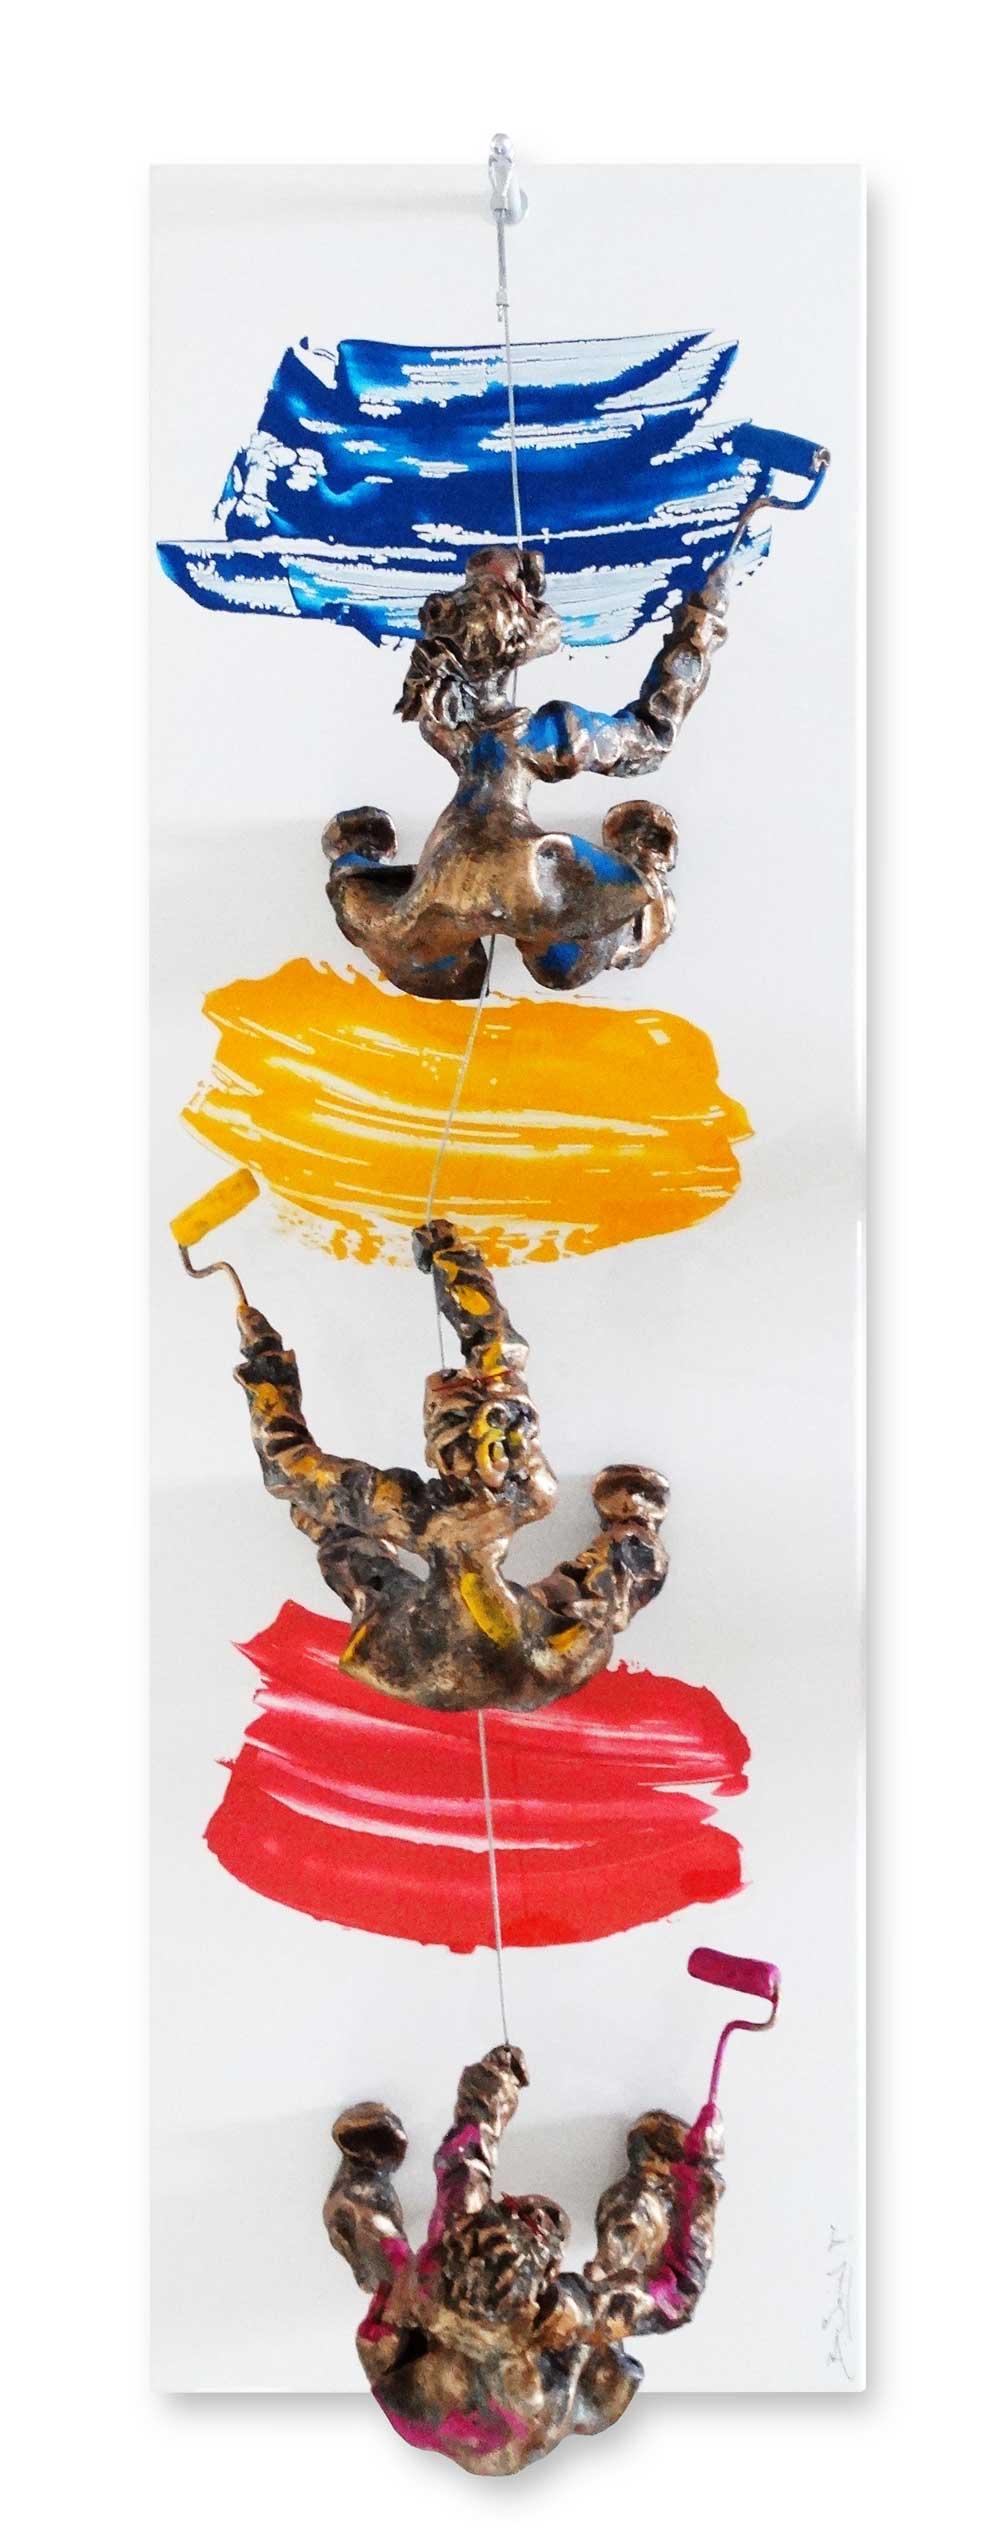 Bernard Saint Maxent - Escalade - 40x120cm